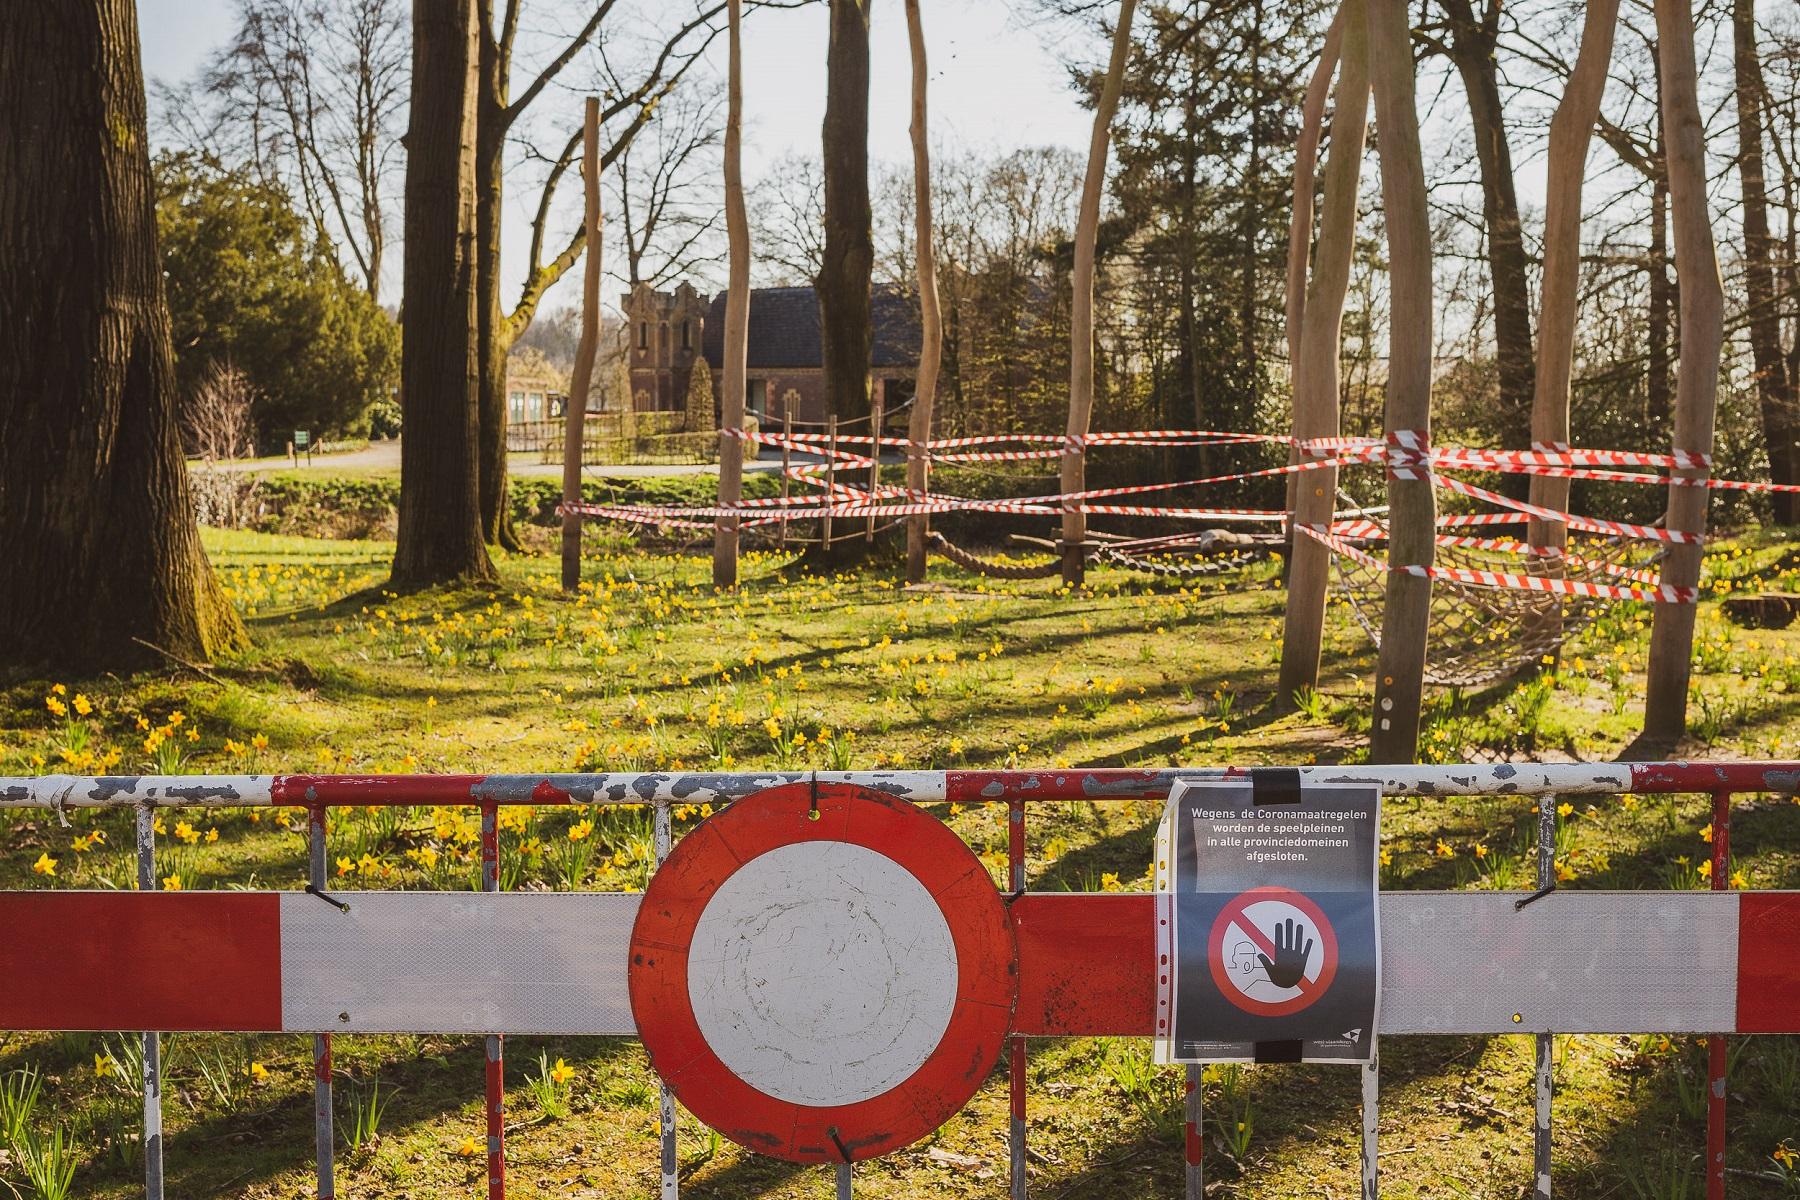 Provinciedomein d'Aertrycke tijdens de corona lockdown 2020 © Glenn Vanderbeke